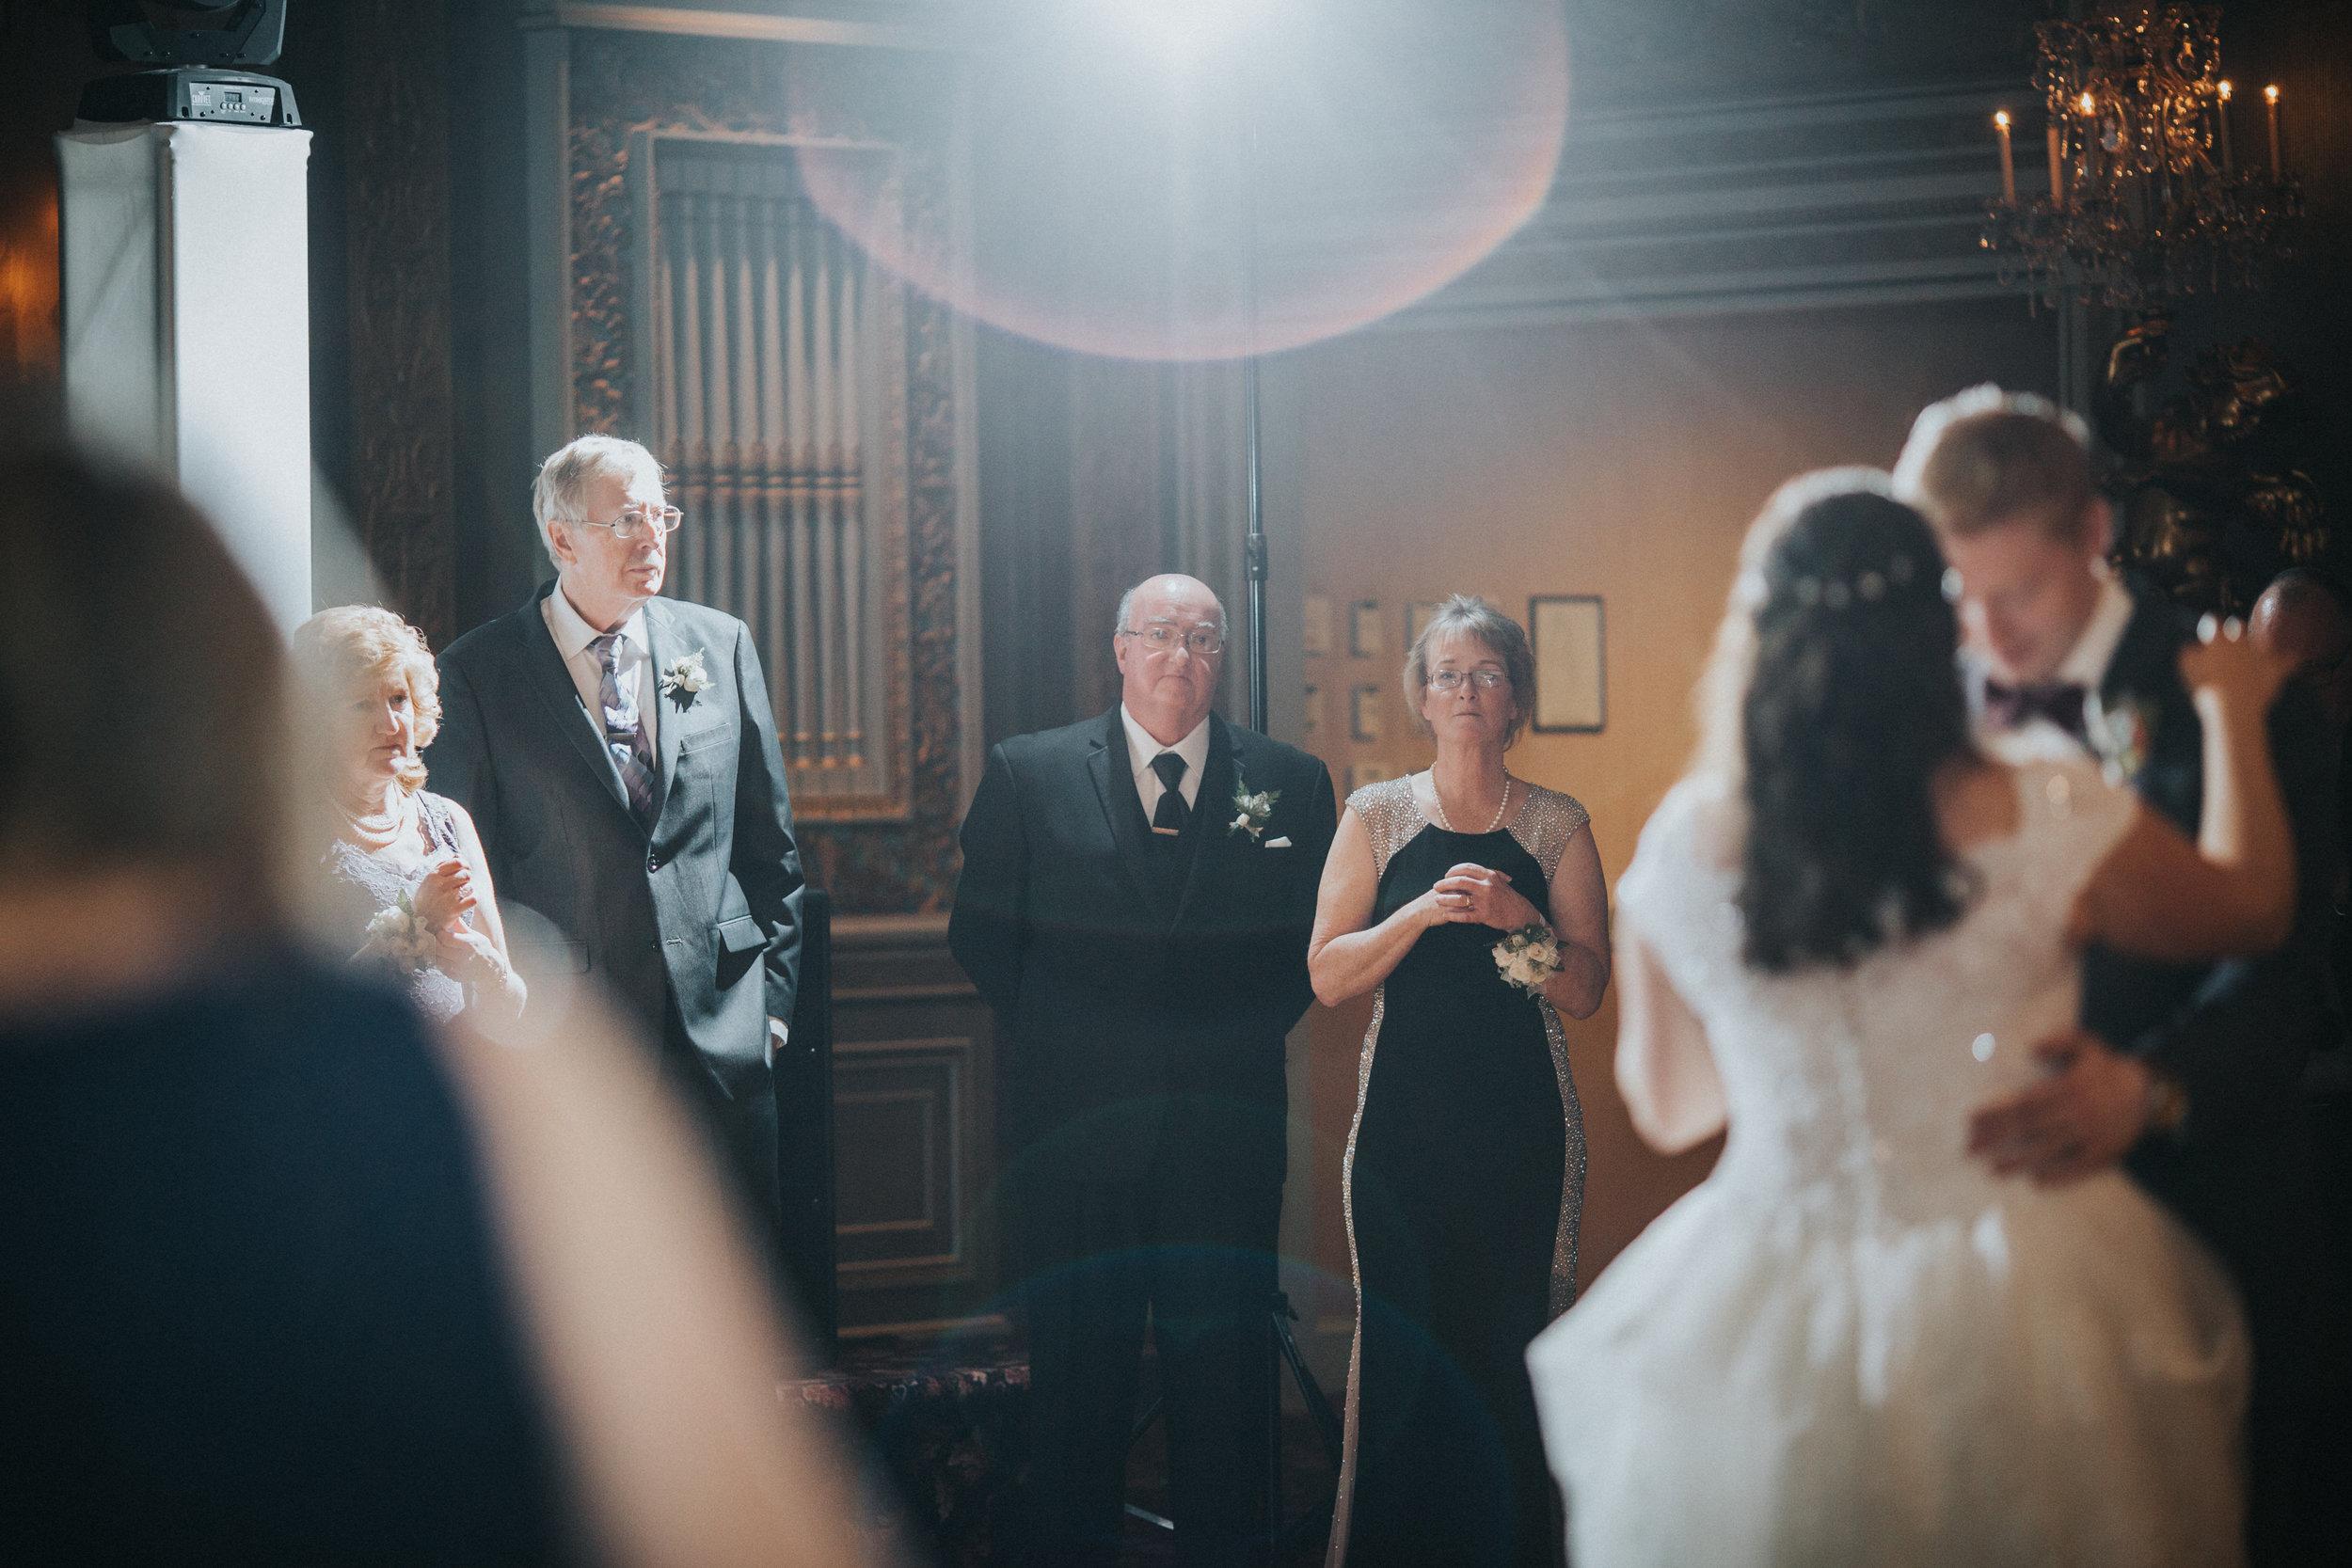 New-Jersey-Wedding-Photography-Fishers-Tudor-House-JennaLynnPhotography-Reception-Kathleen&Eddie-20.jpg